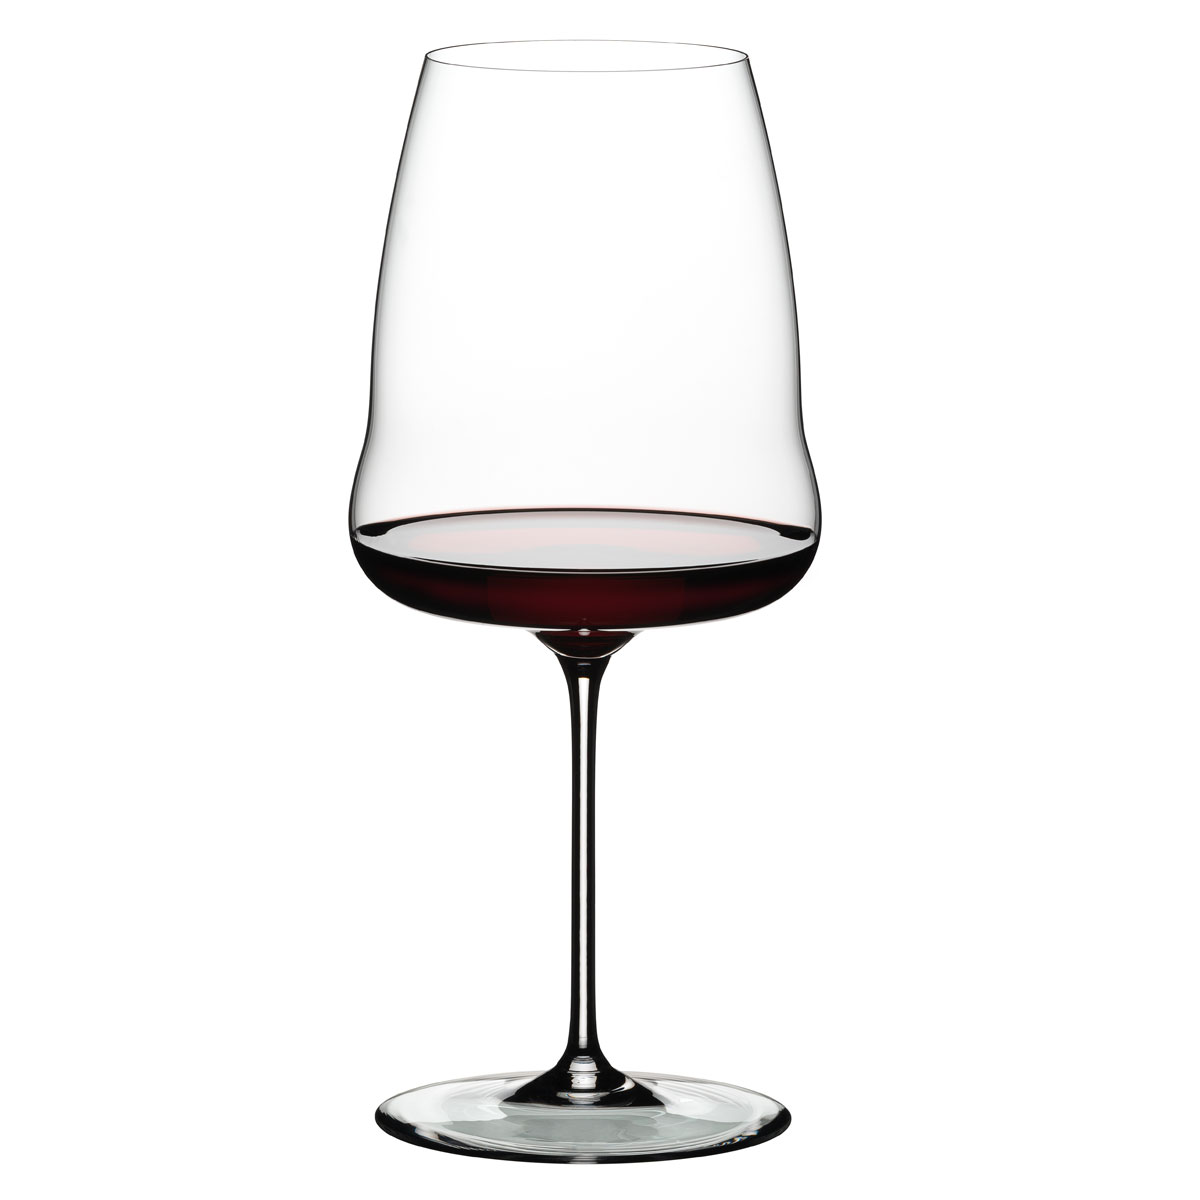 Riedel Winewings Syrah Wine Glass, Single